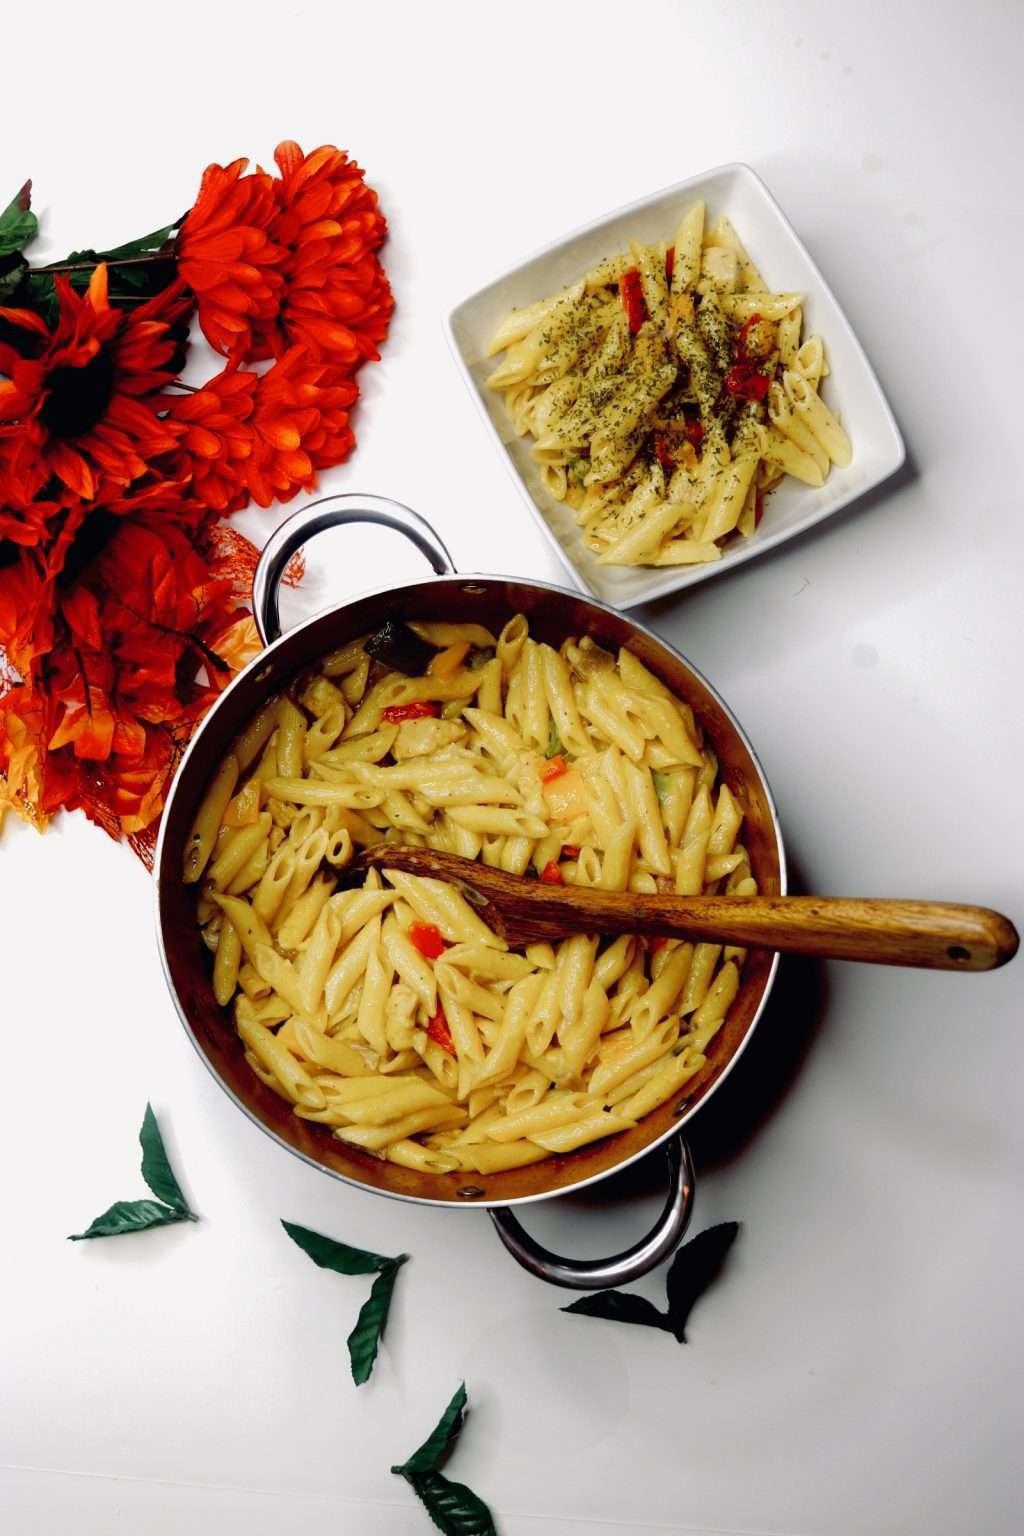 pasta chicken fajita recipe meal 1 1024x1536 - The Best Chicken Fajita Pasta Recipe For The Holiday Season